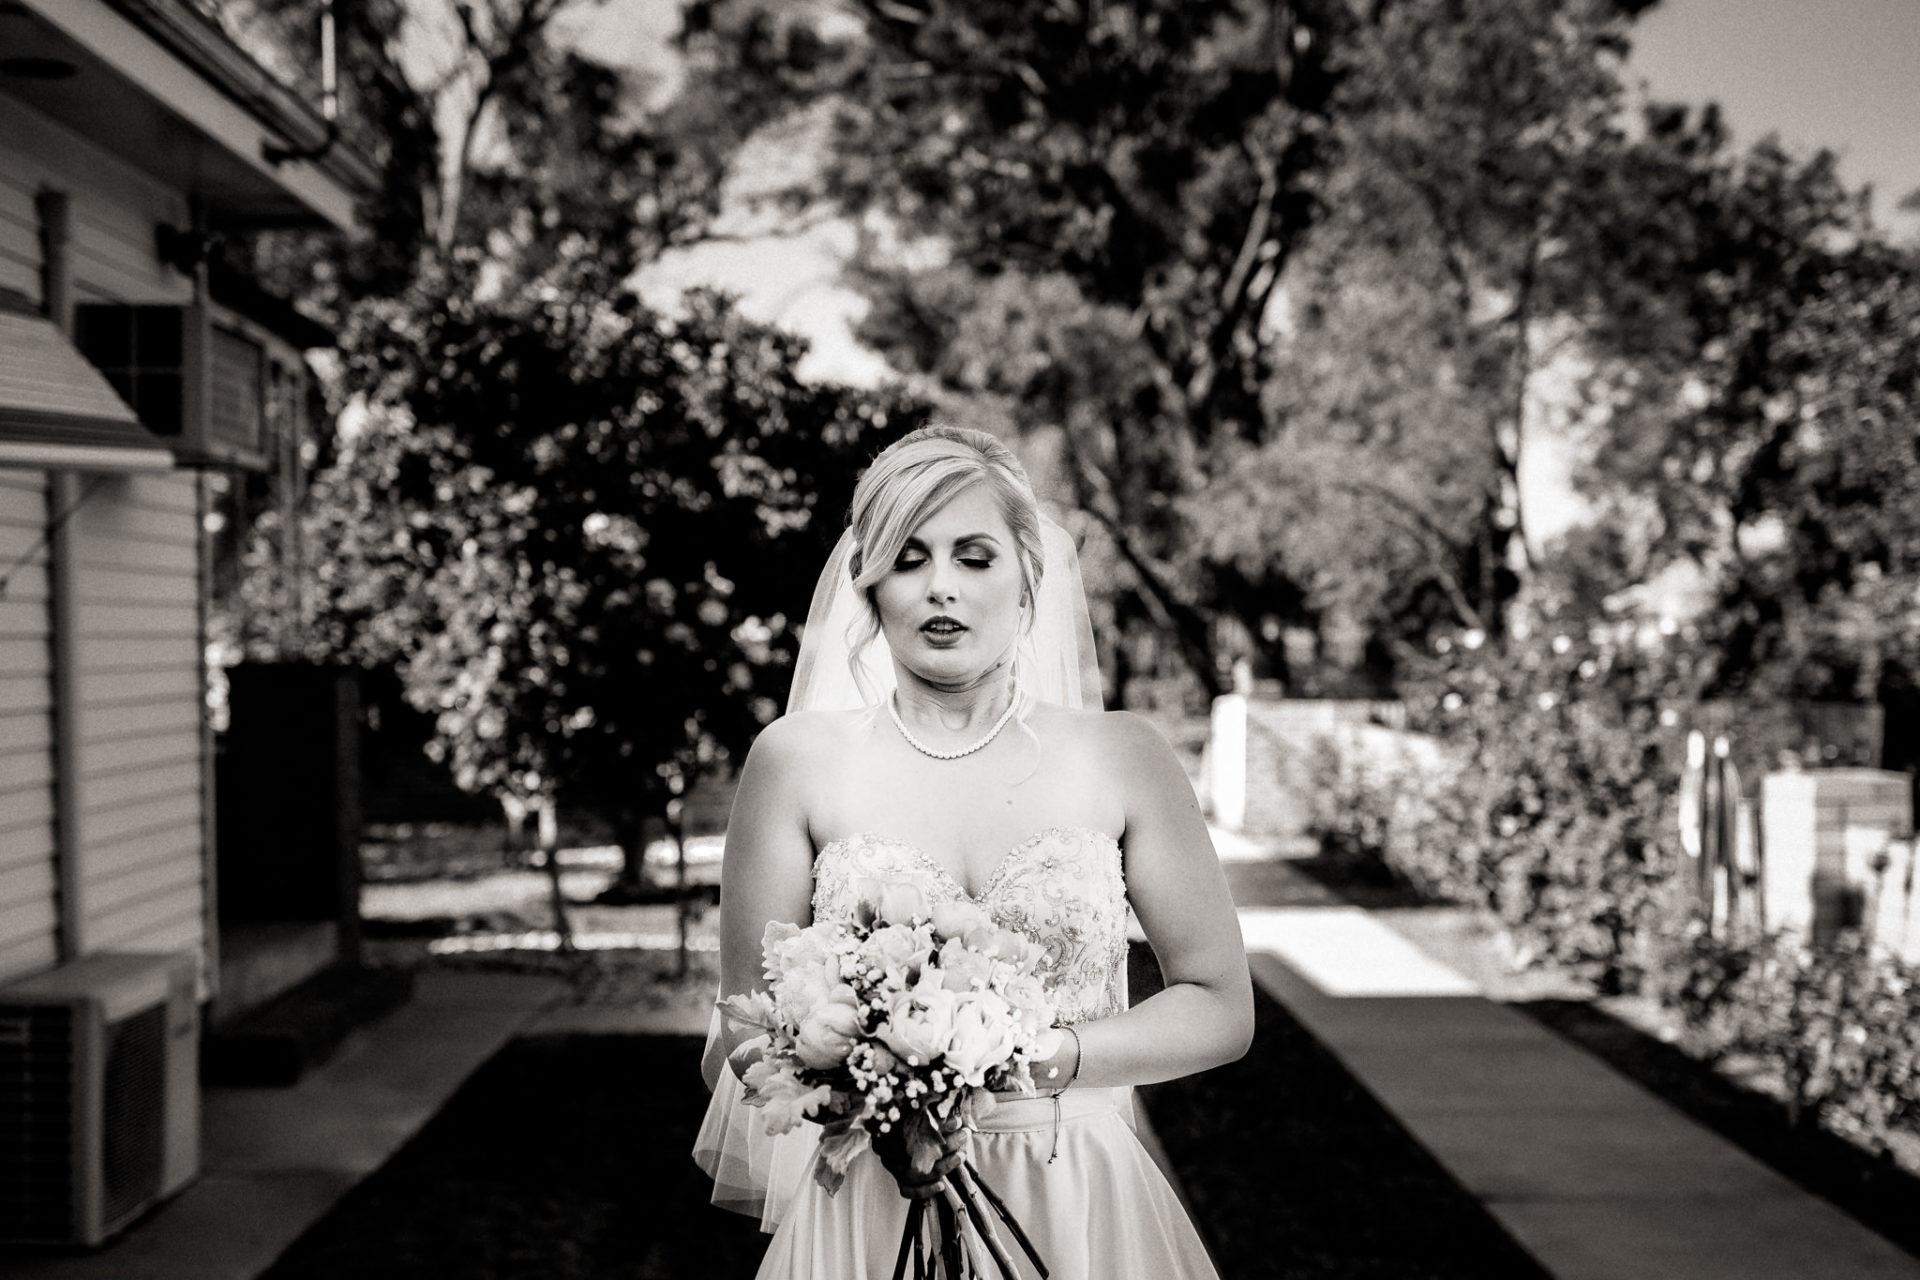 backyard-wedding-australia-melbourne-ceremony-bride-before-walking-down-isle-exhited-inhale